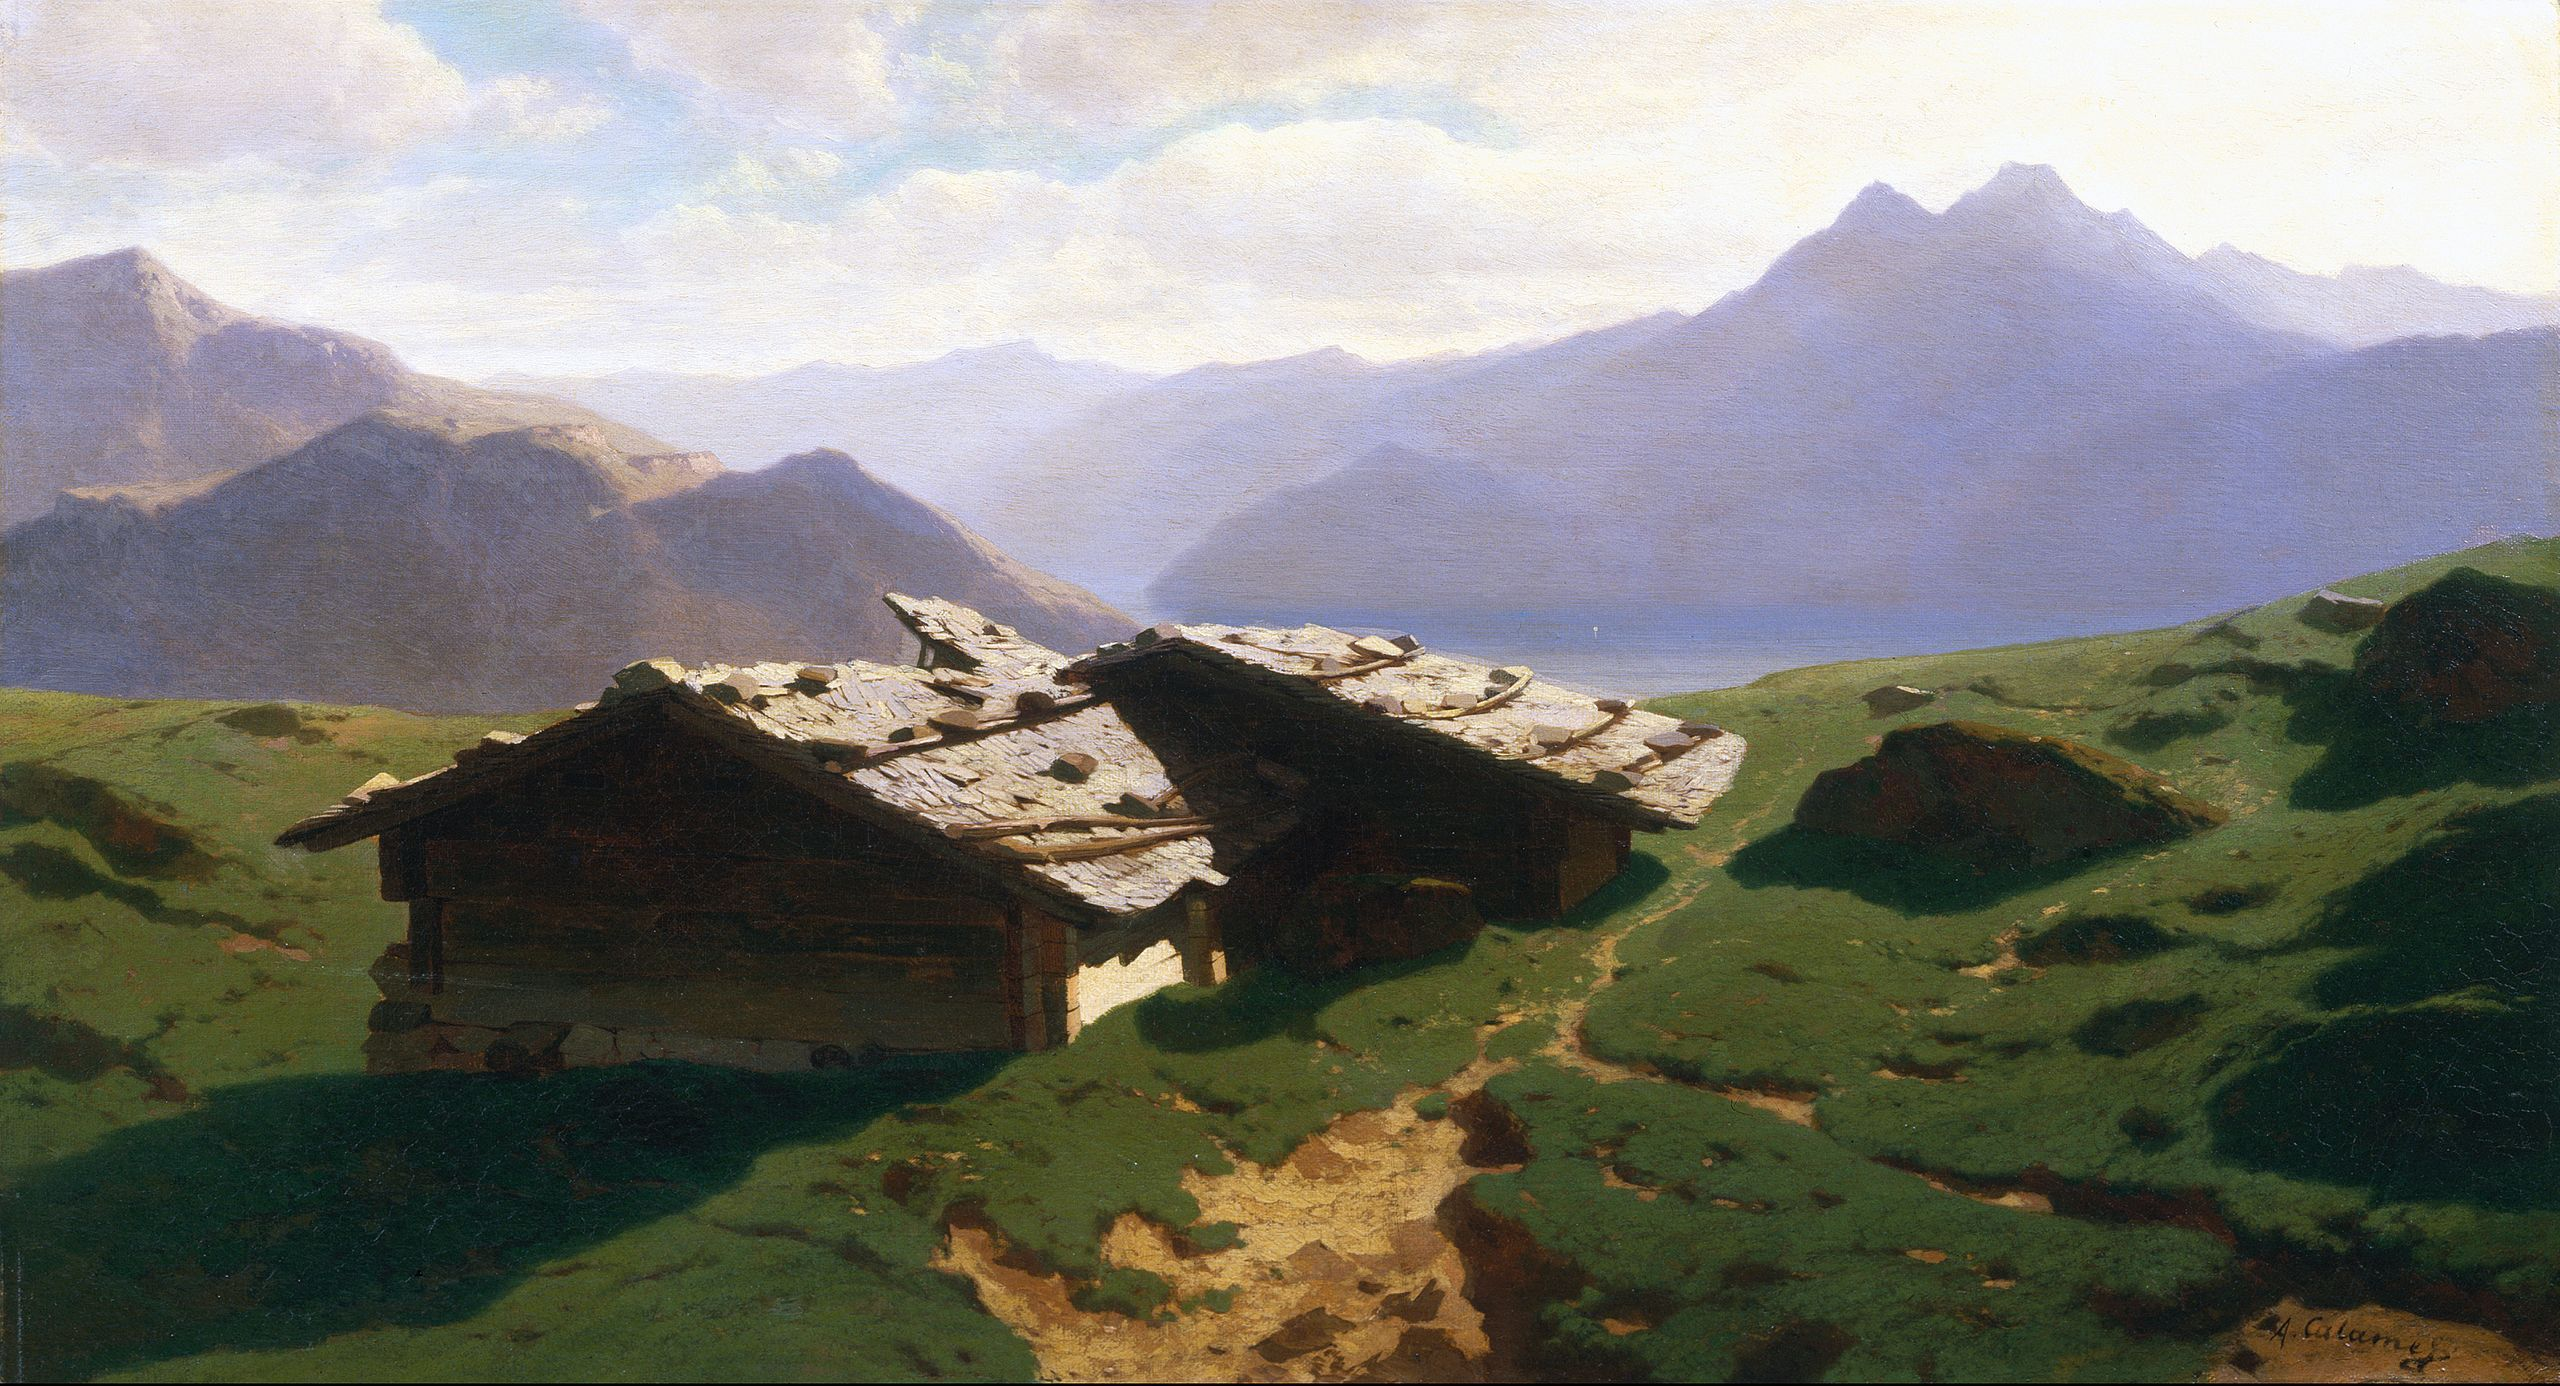 Alexandre Calame's Chalets at Rigi (1861)